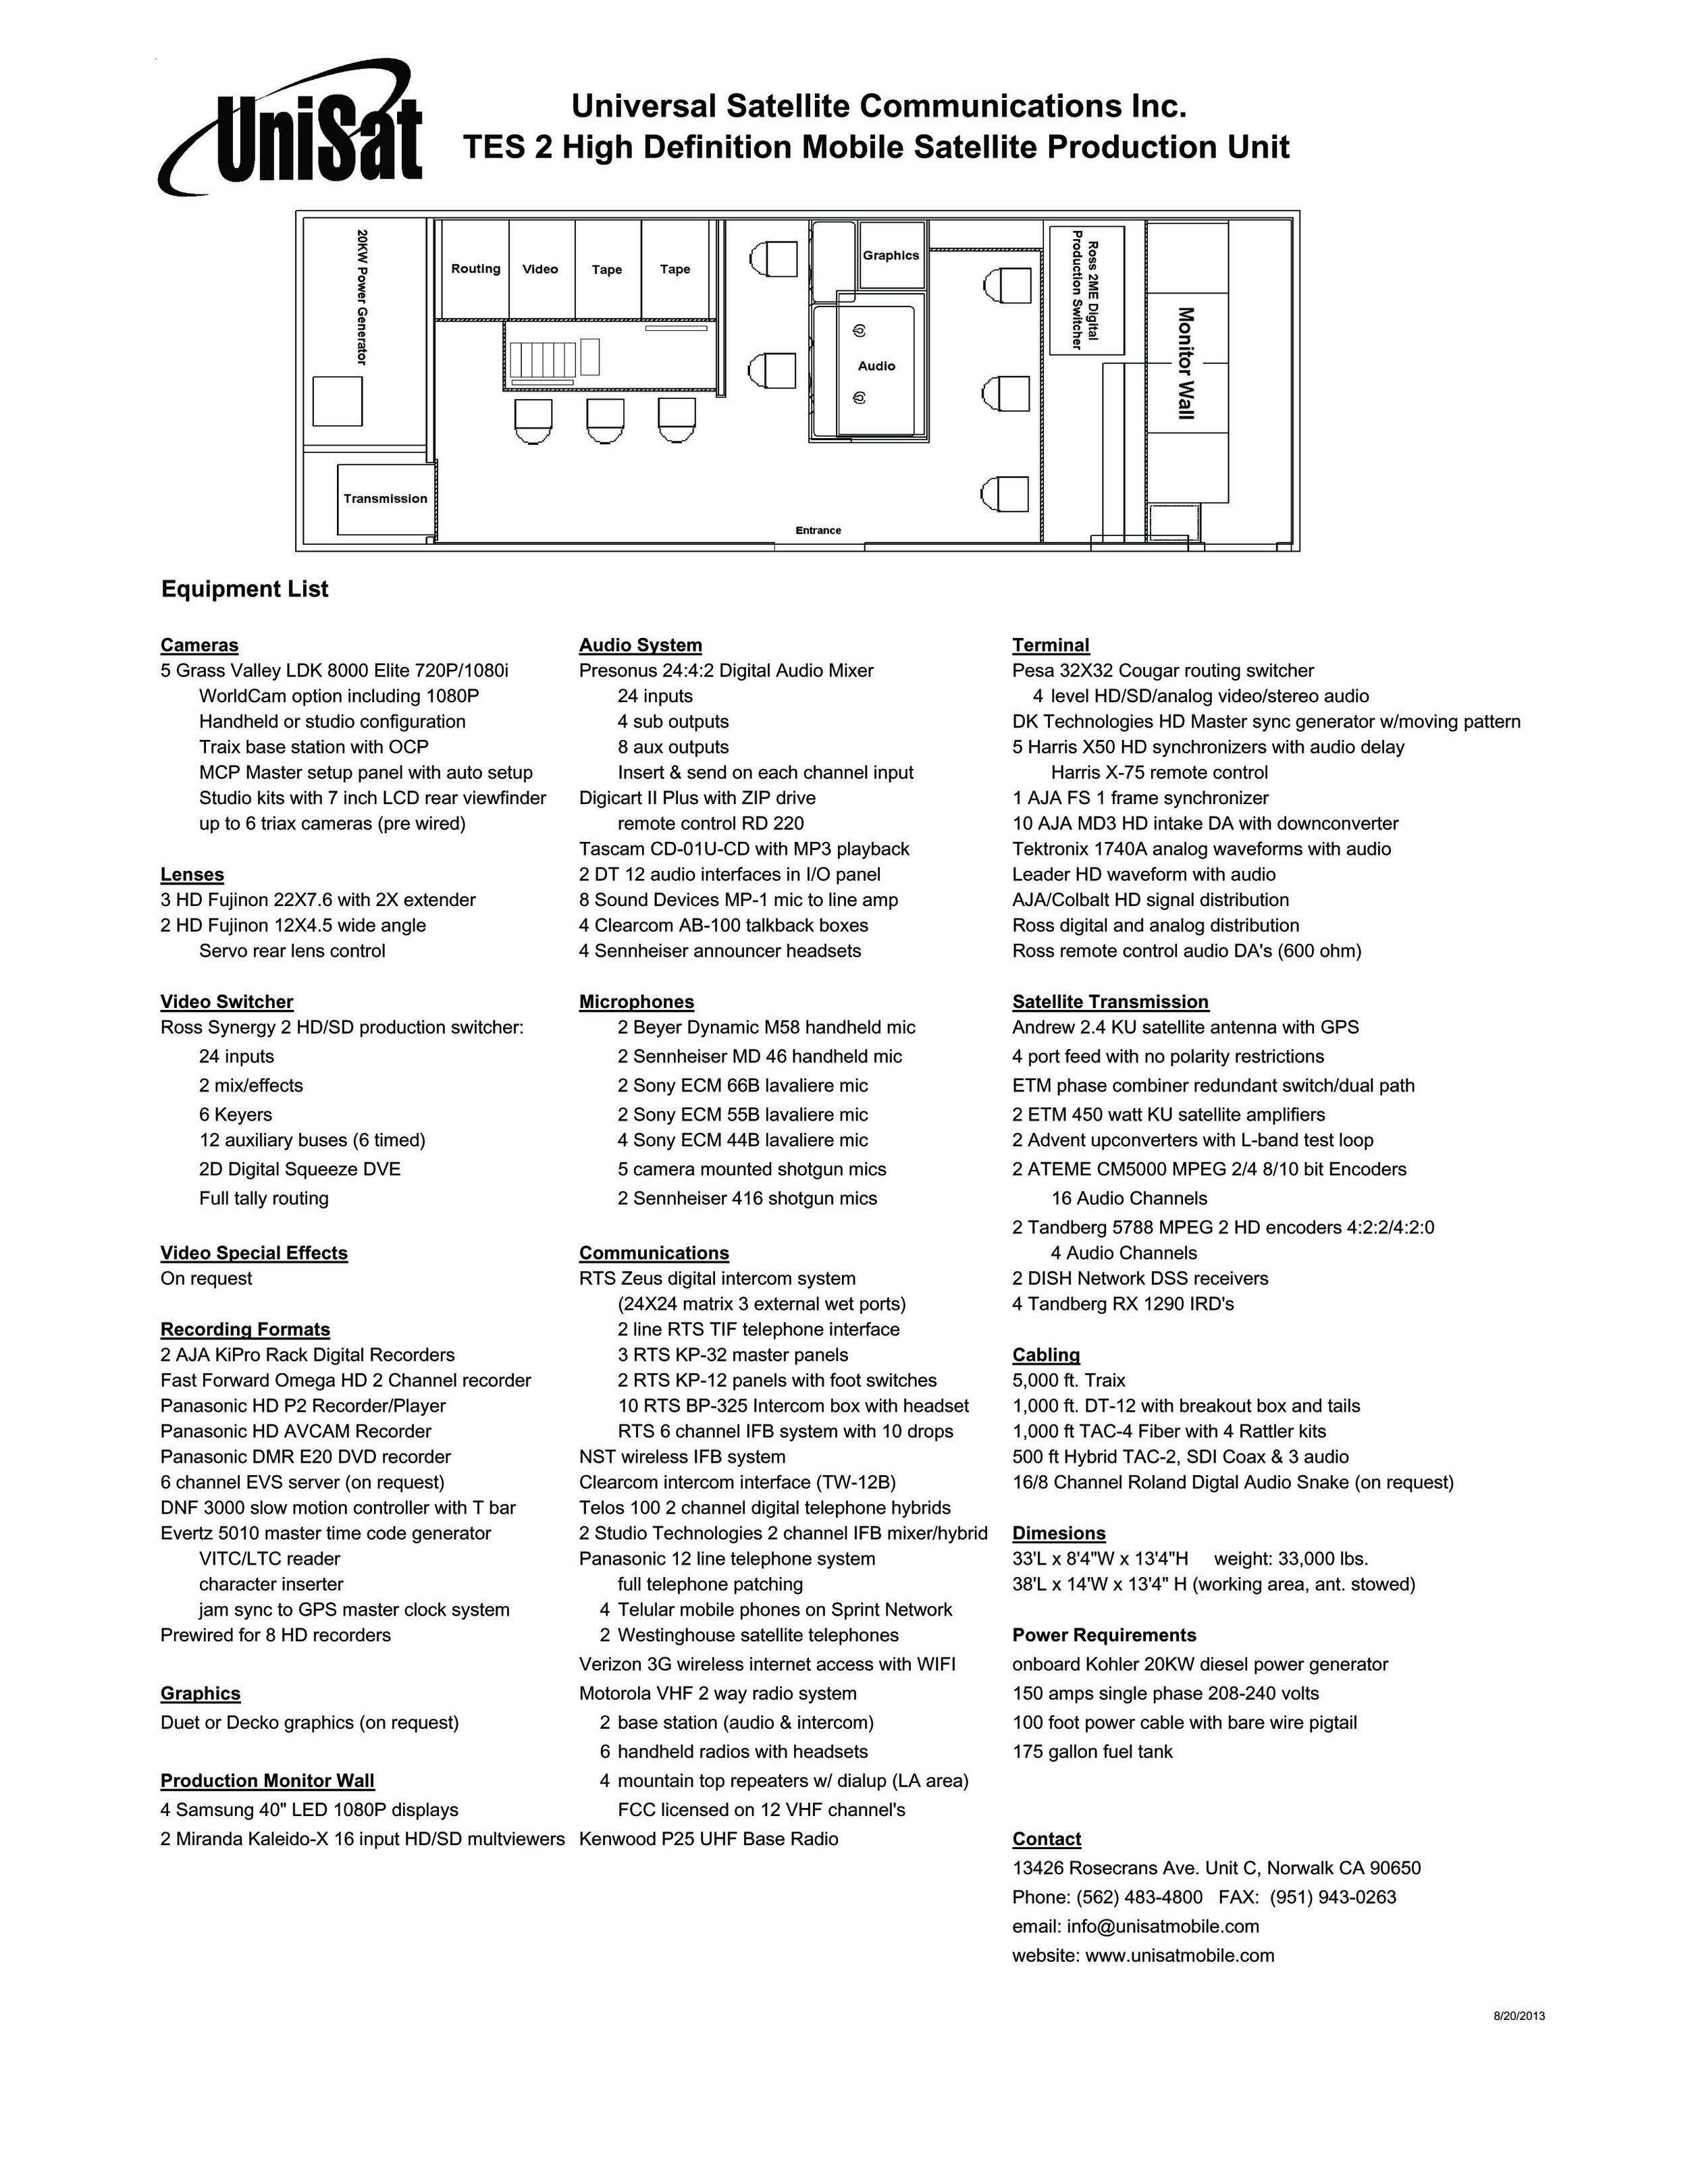 UniSat-TES 2 HD spec sheet-apr 2017.jpg